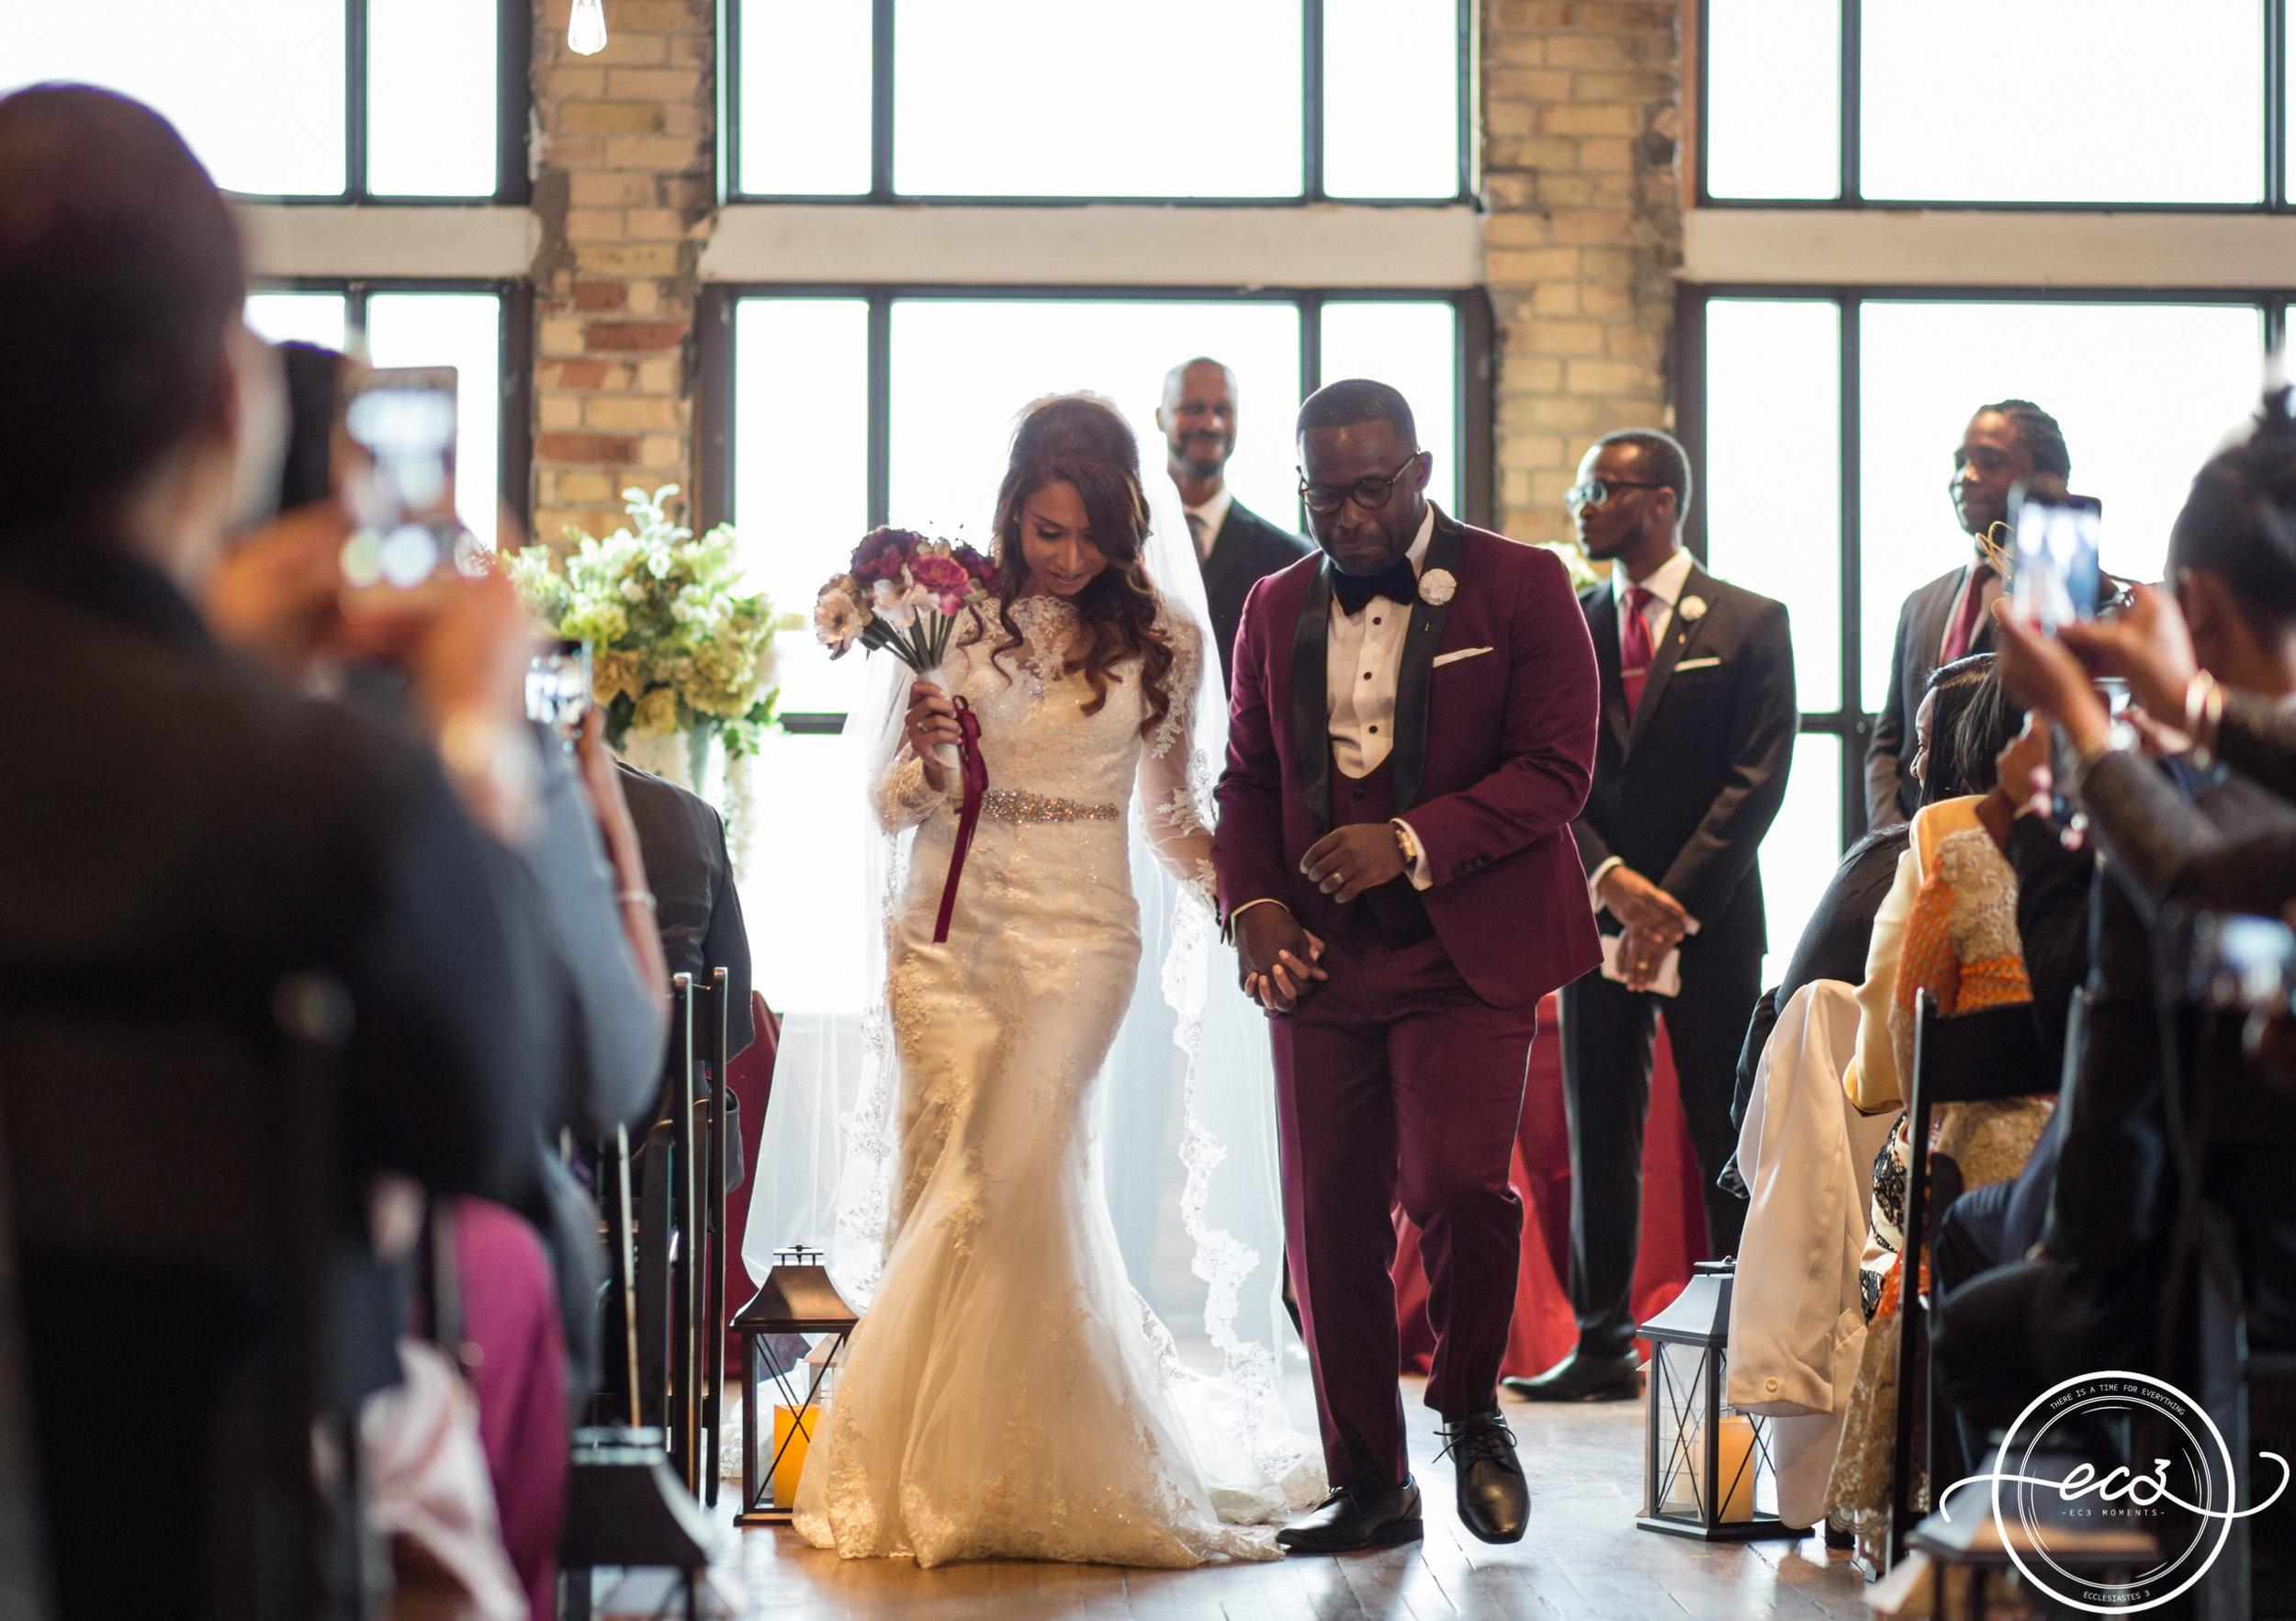 AA-Rustic-Toronto-Burroughes-Wedding26.jpg